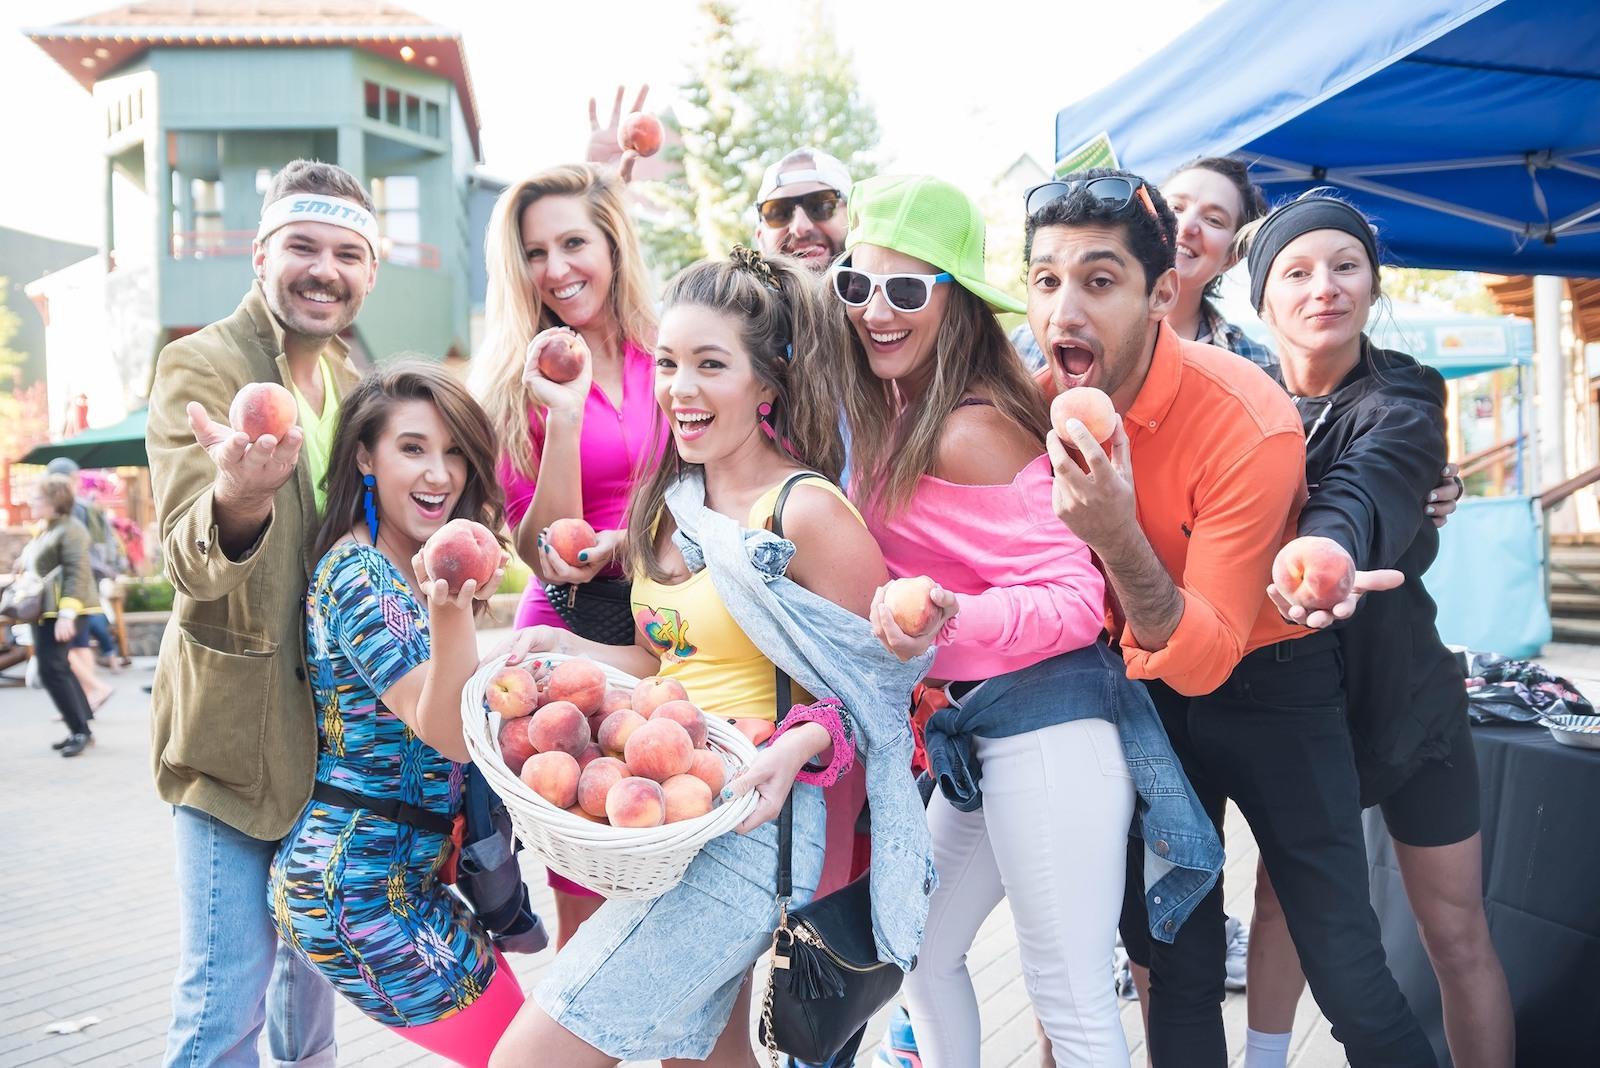 Gambar orang memegang buah persik di Keystone Mountain Town Music Festival di Colorado